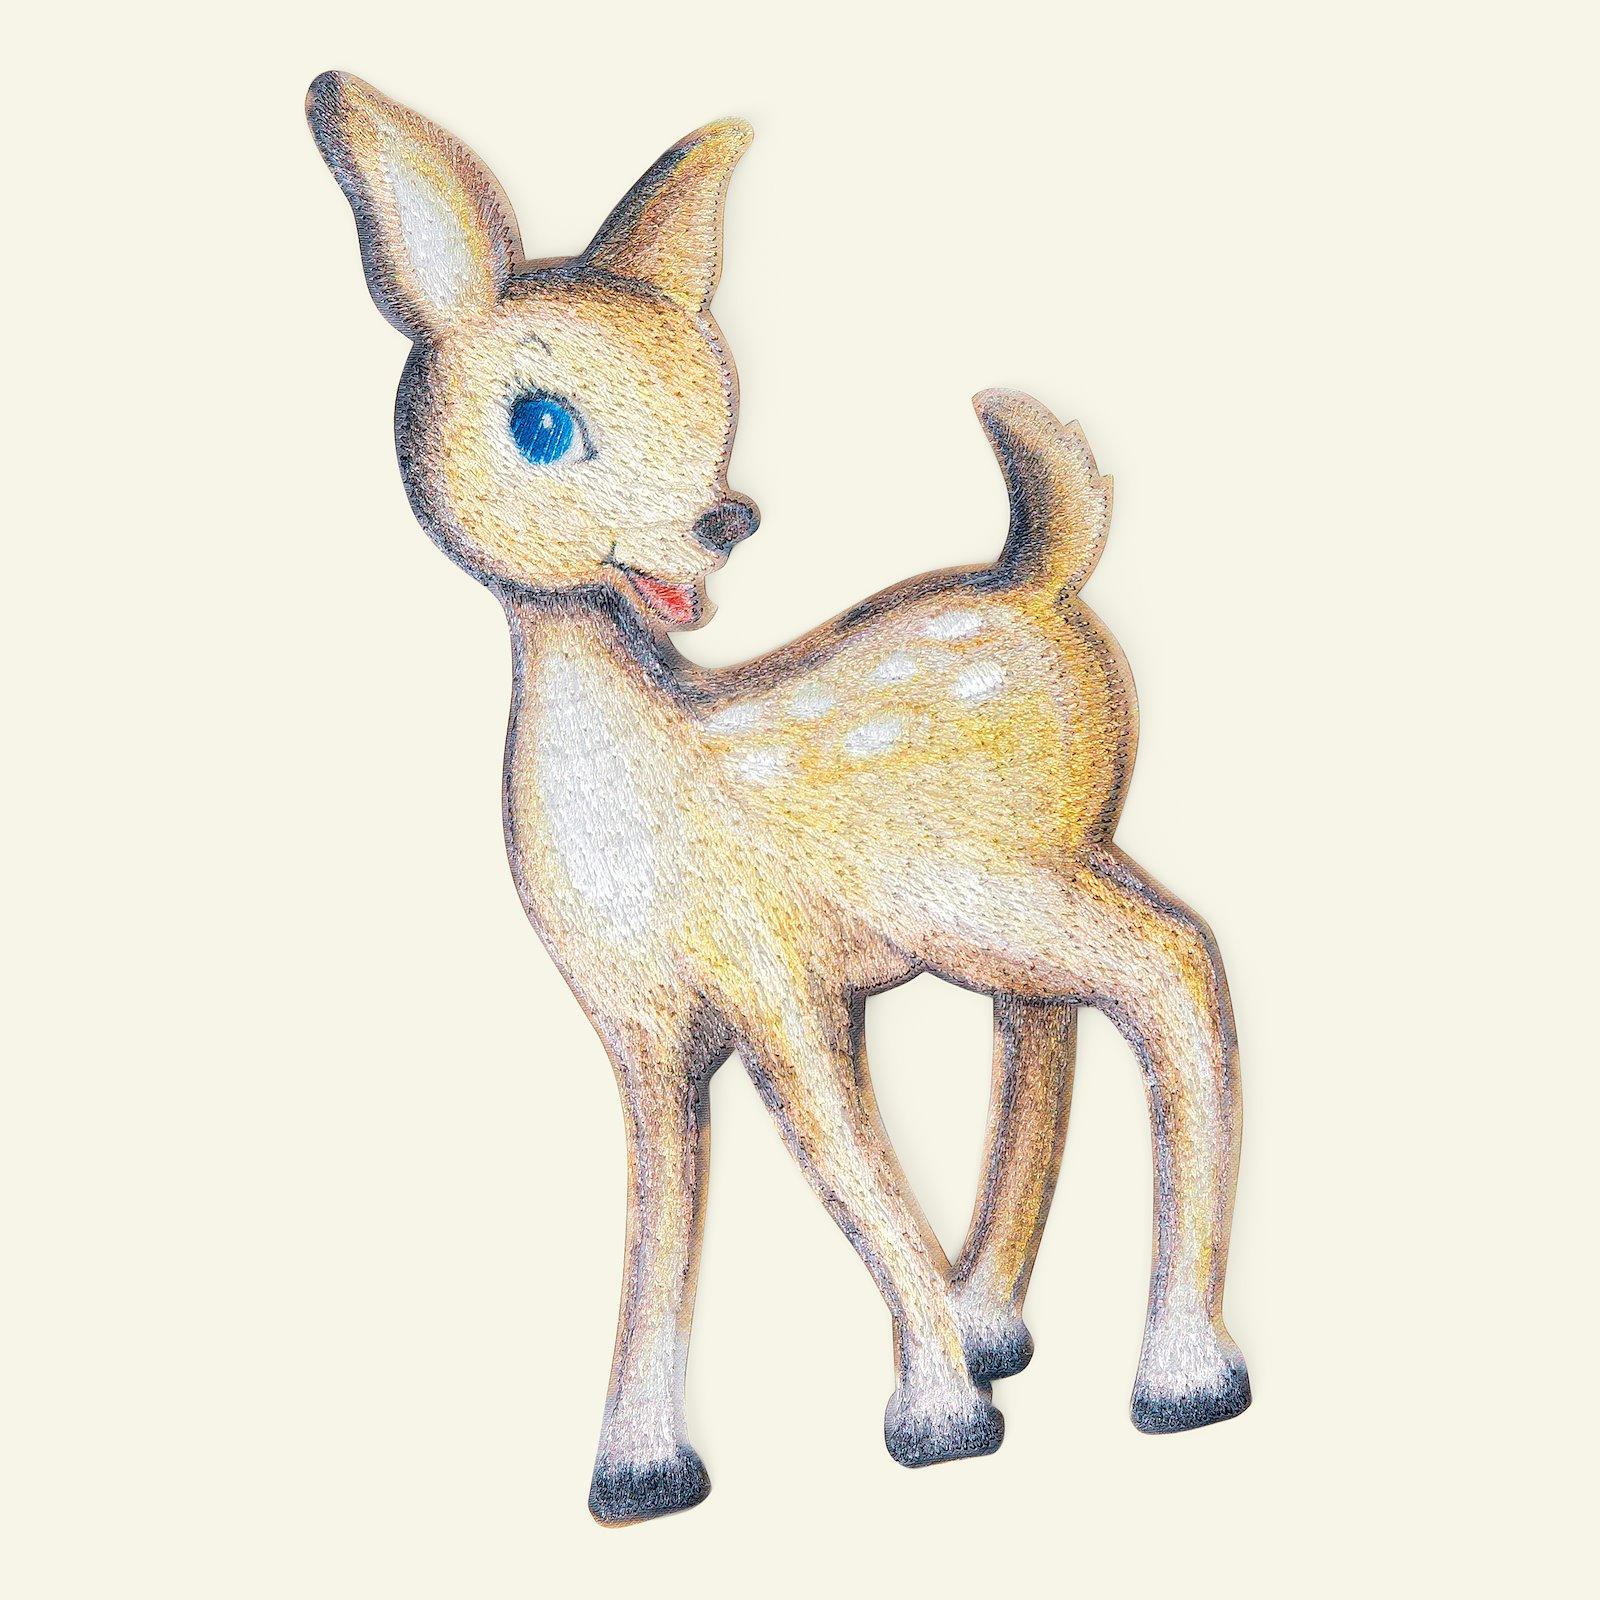 Patch deer 85x173mm brown 1pc 24821_pack